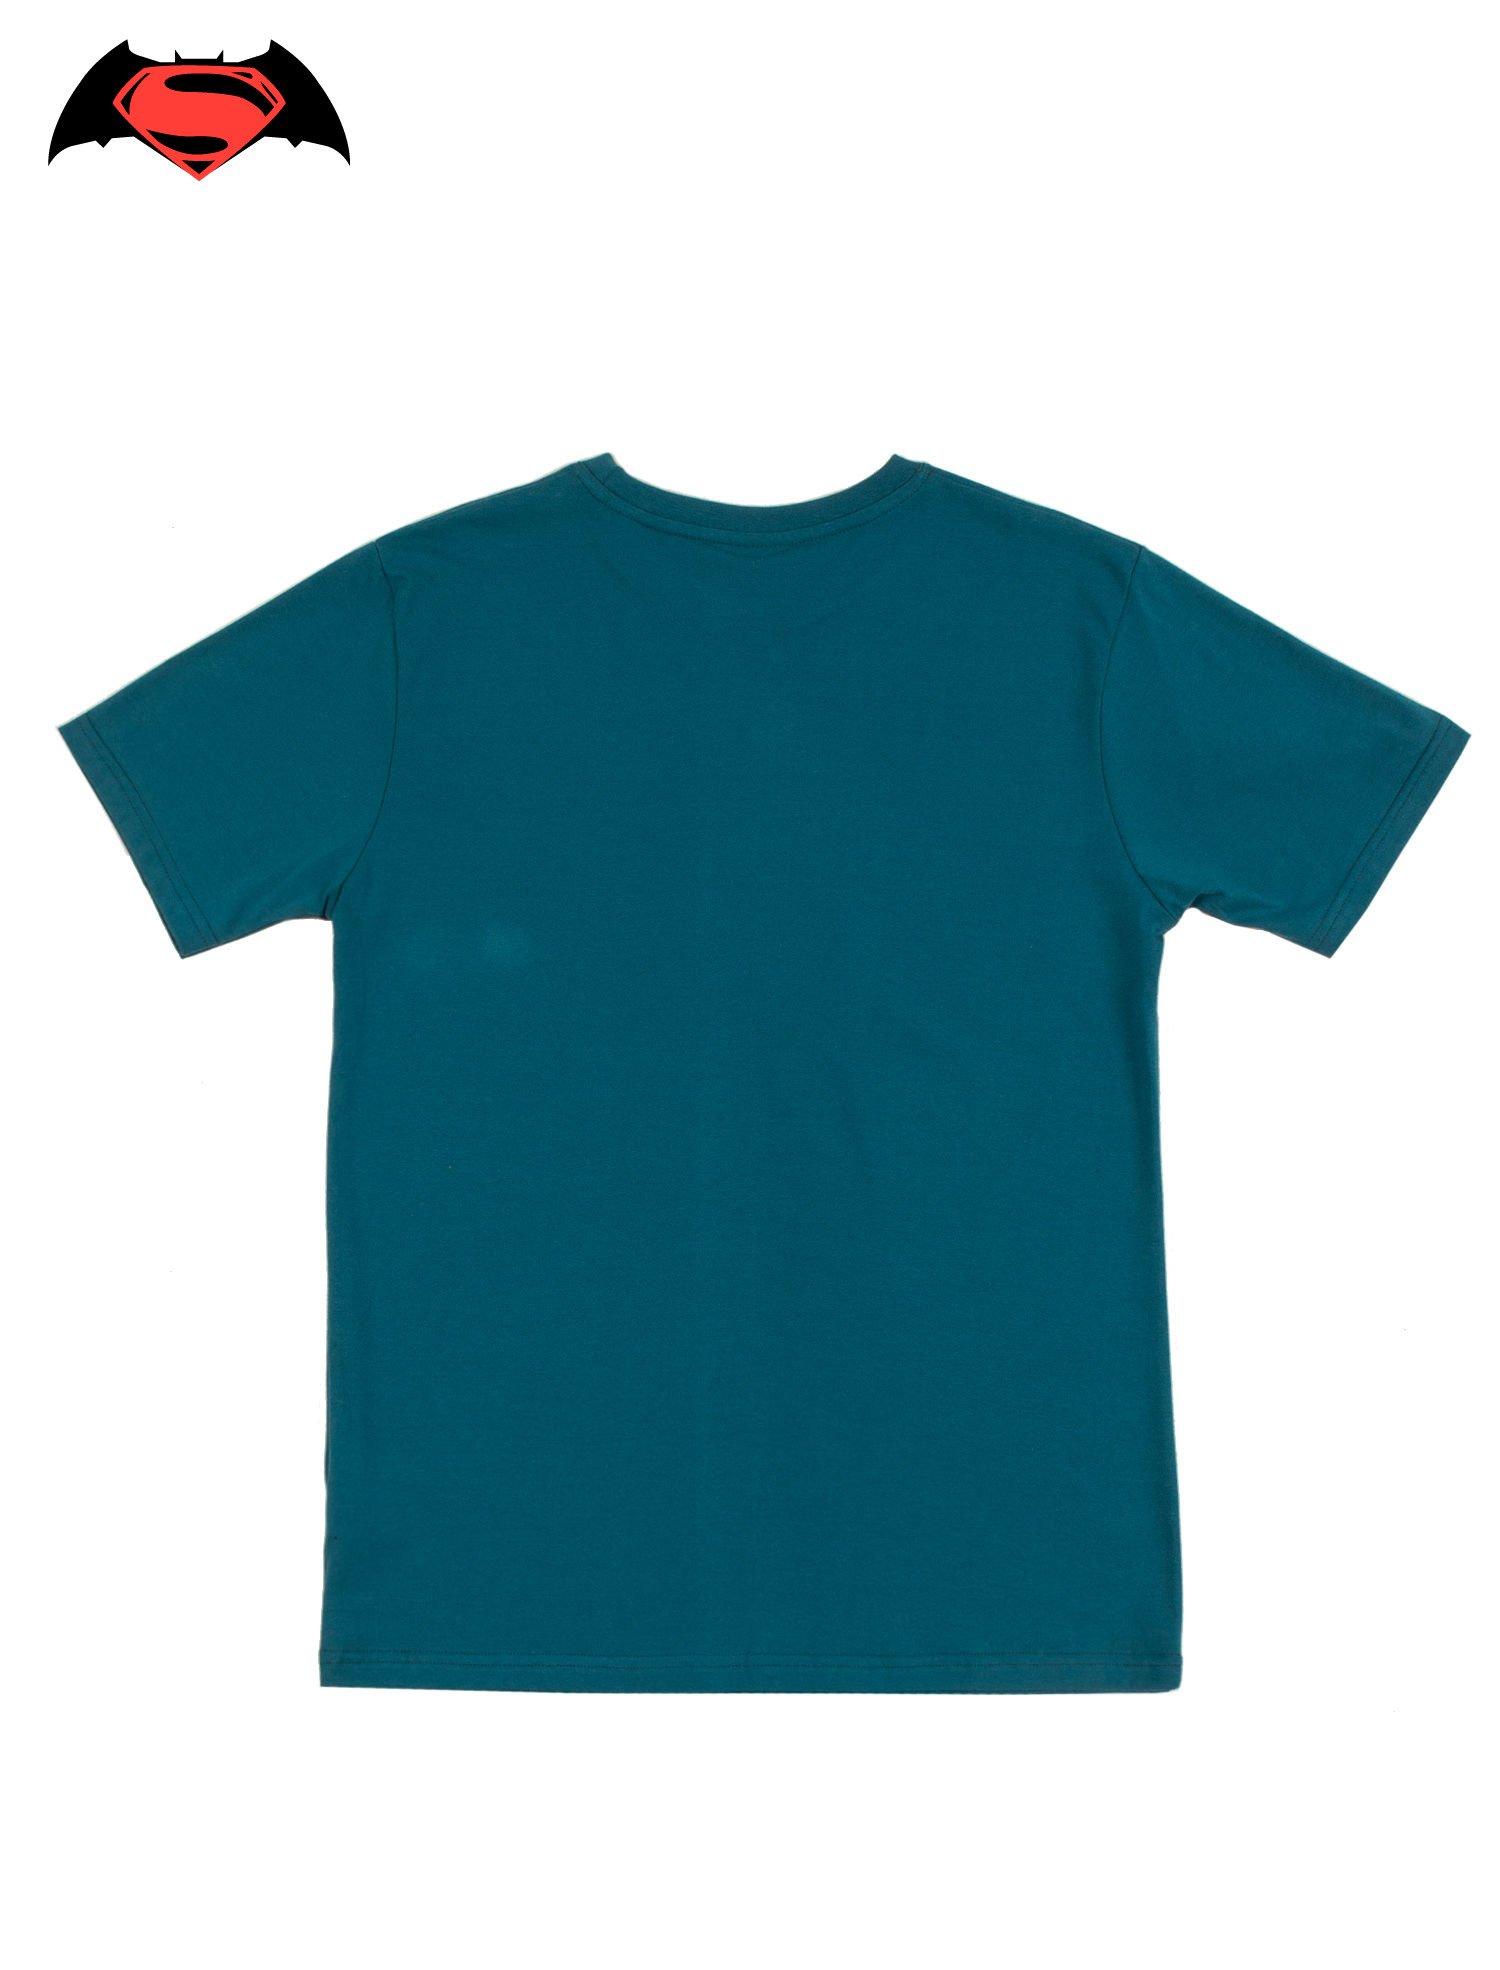 Turkusowy t-shirt męski z motywem BATMAN V SUPERMAN                                  zdj.                                  2